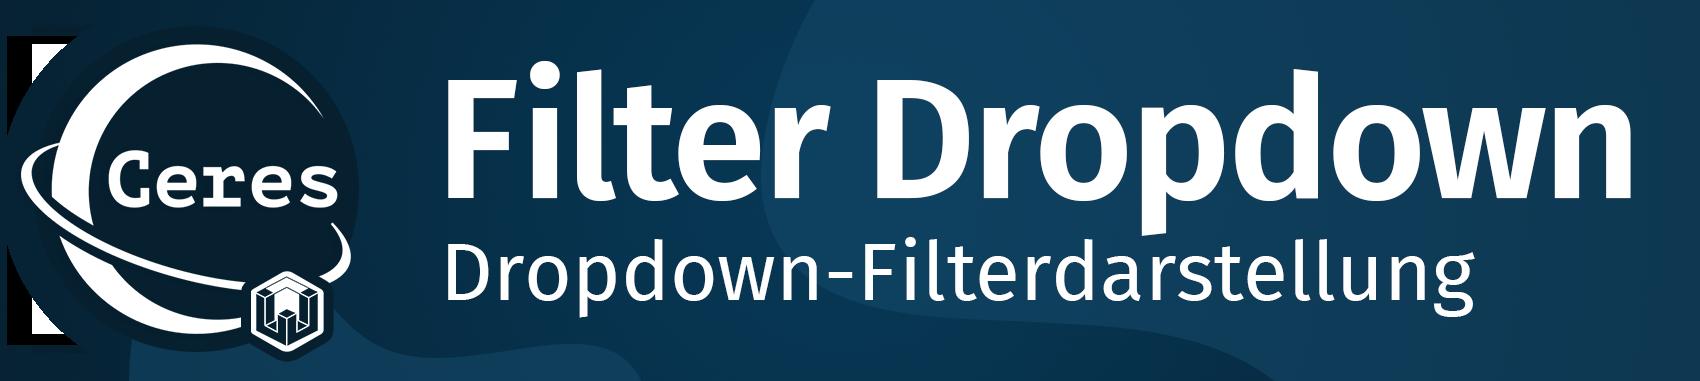 Ceres Beautifier: Filter Dropdown